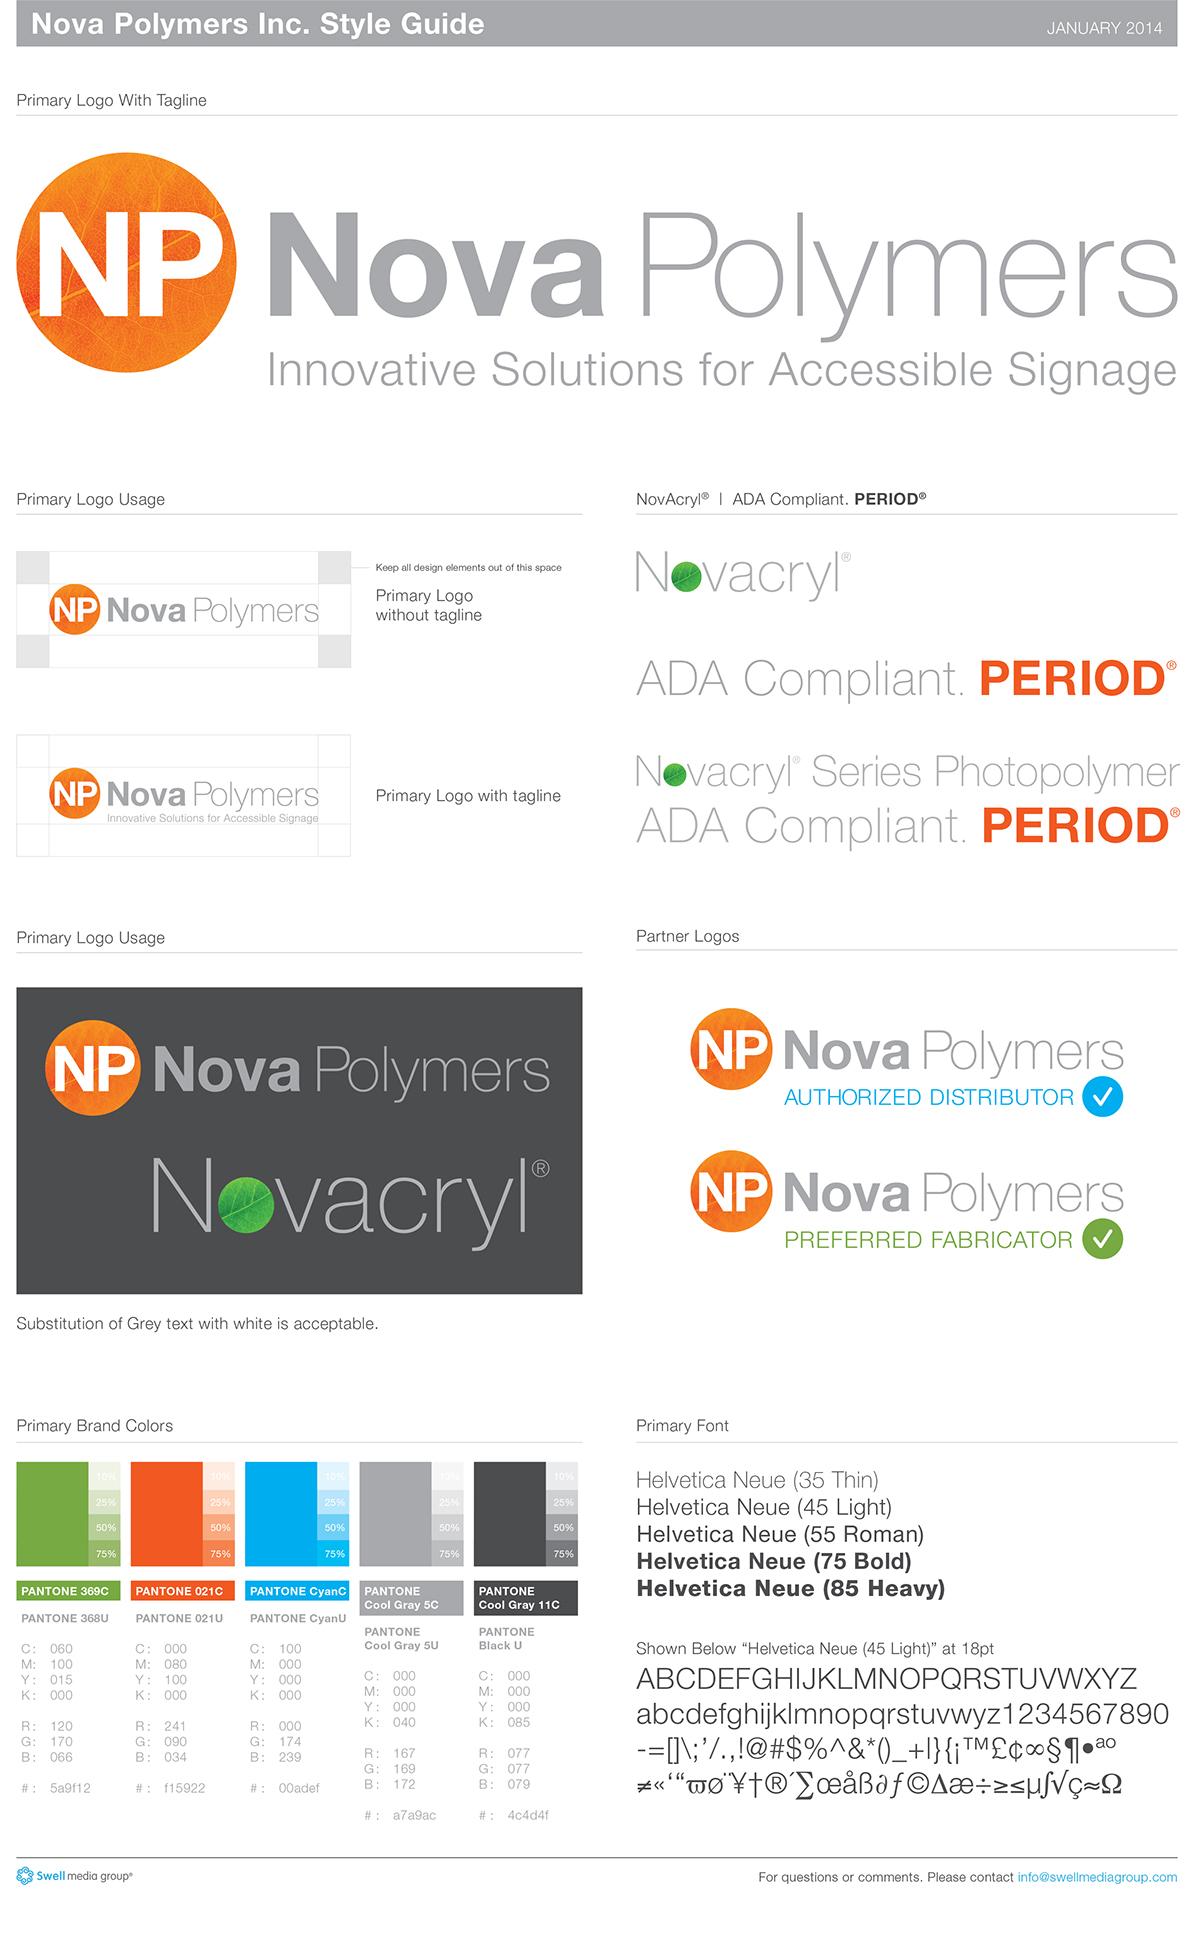 Nova Polymers brand style guide